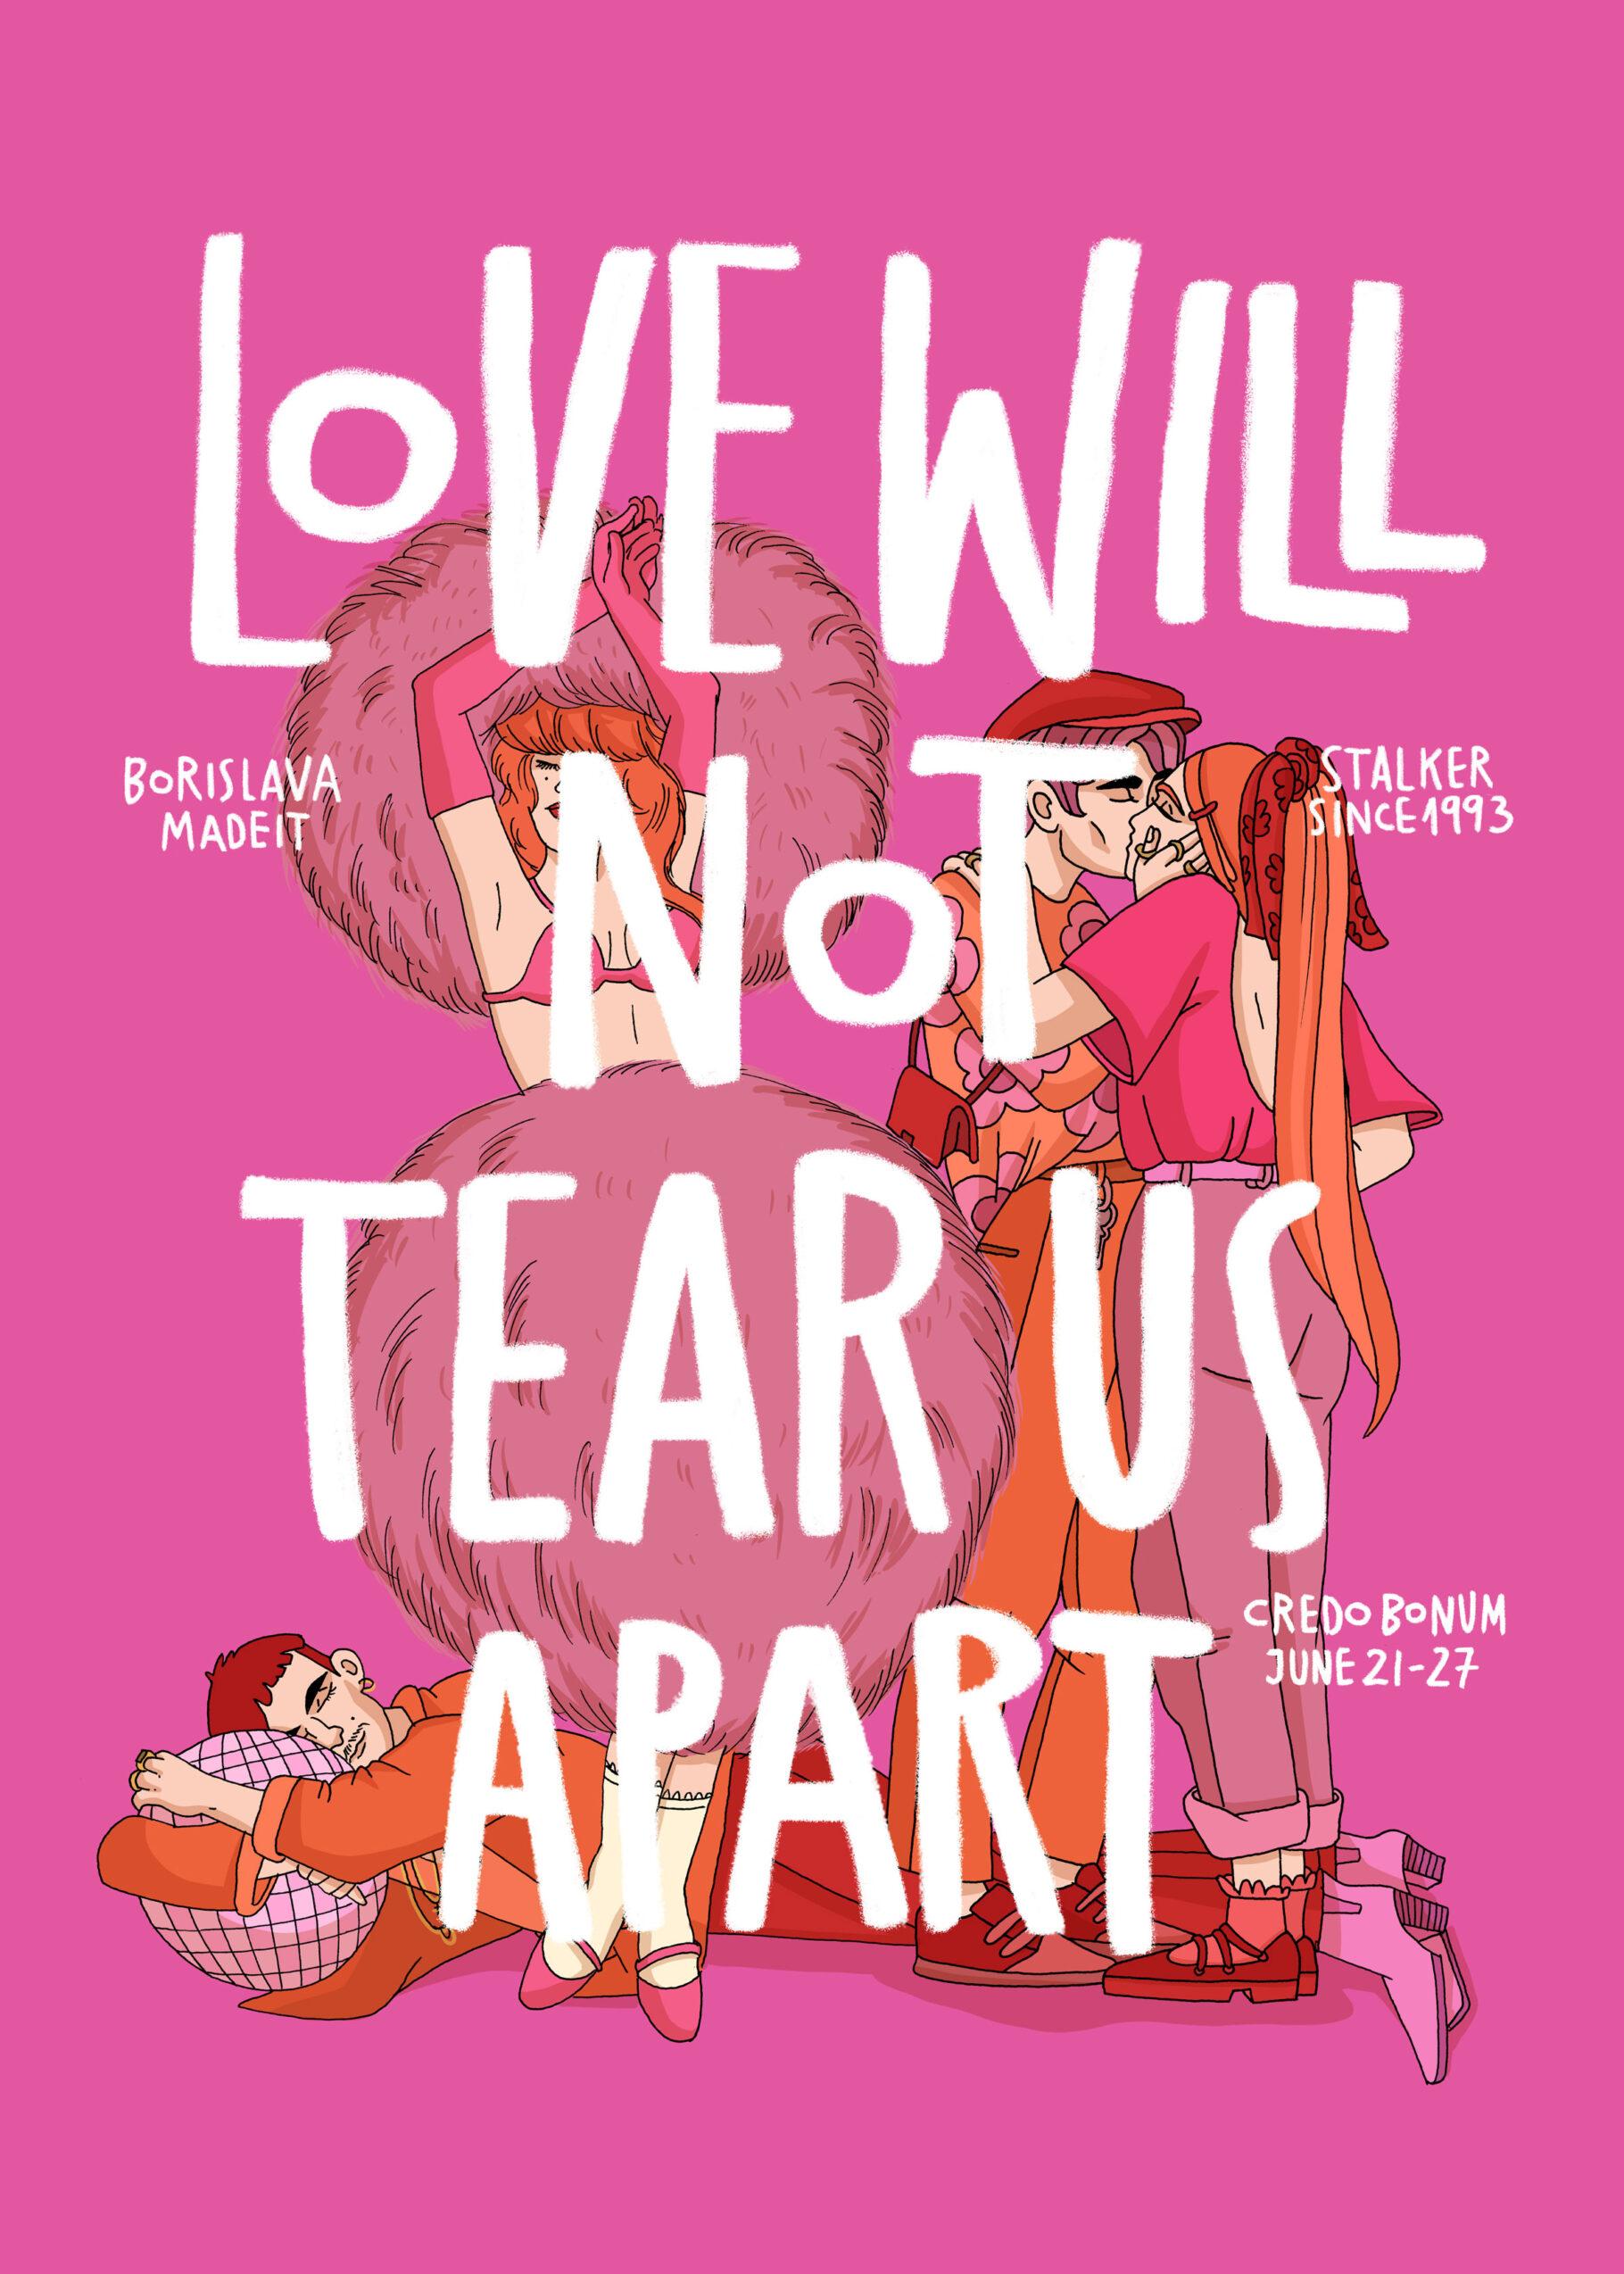 LOVE WILL NOT TEAR US APARTexhibition – Borislava Madeit & Stalker since 1993